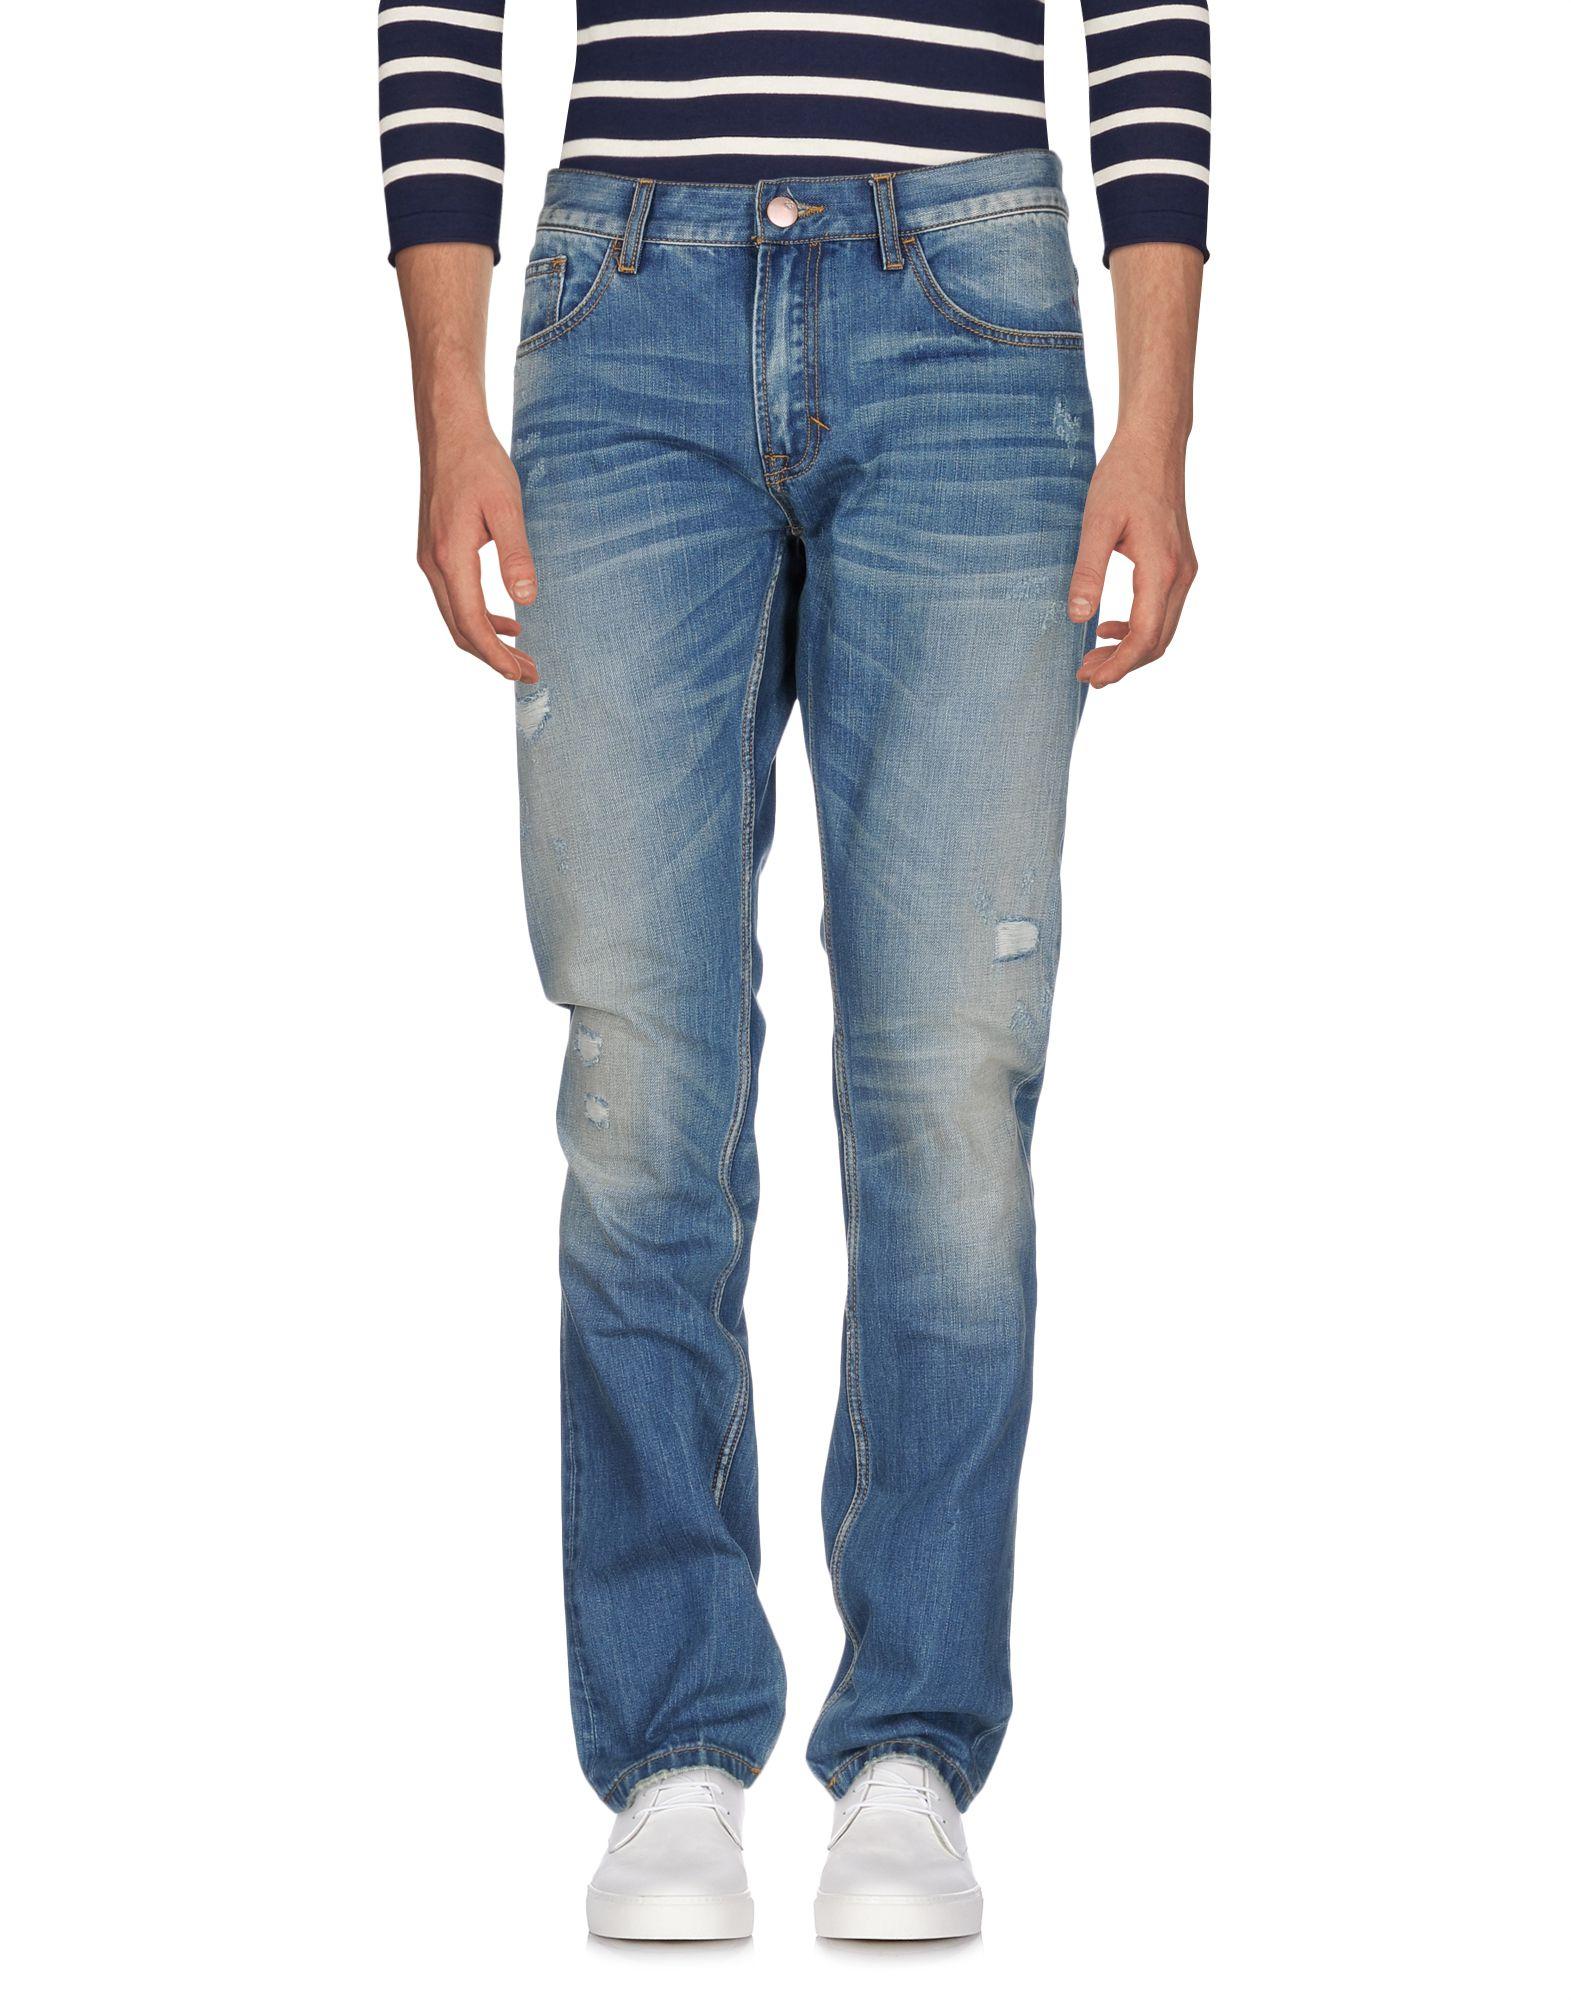 Pantaloni Jeans Jeans Pantaloni Sun 68 Uomo - 42625116HW 890608